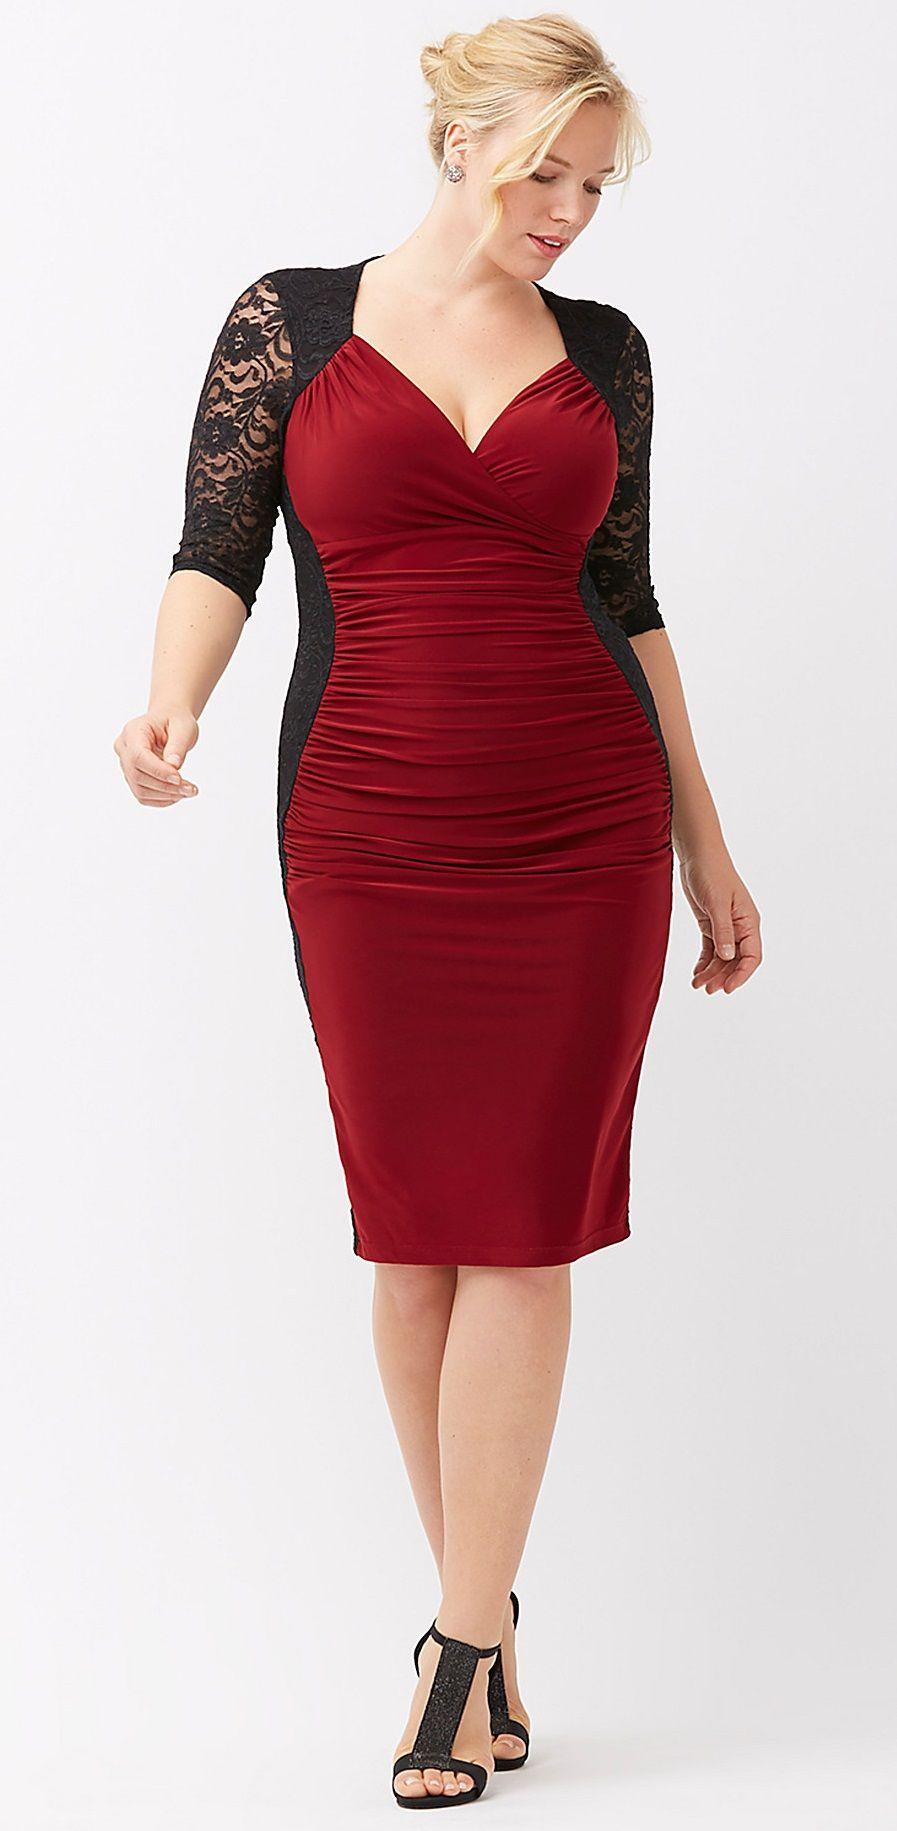 plus size valentines day date dress plus size lace illusion dress